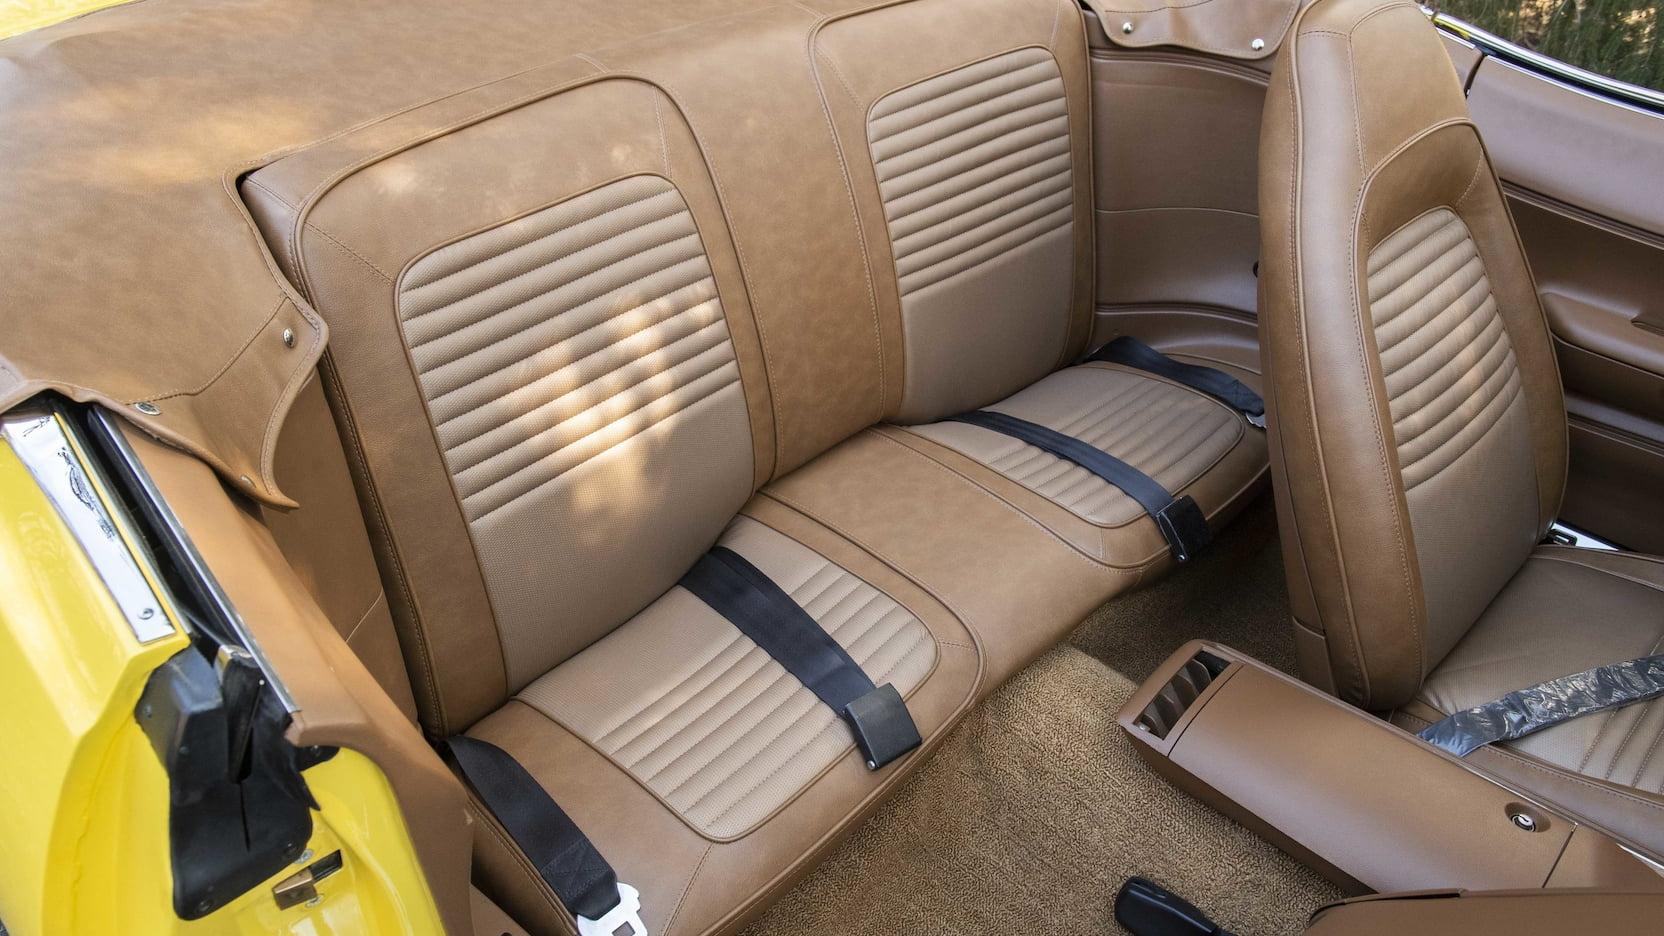 1970 Plymouth Hemi Cuda Convertible rear seats